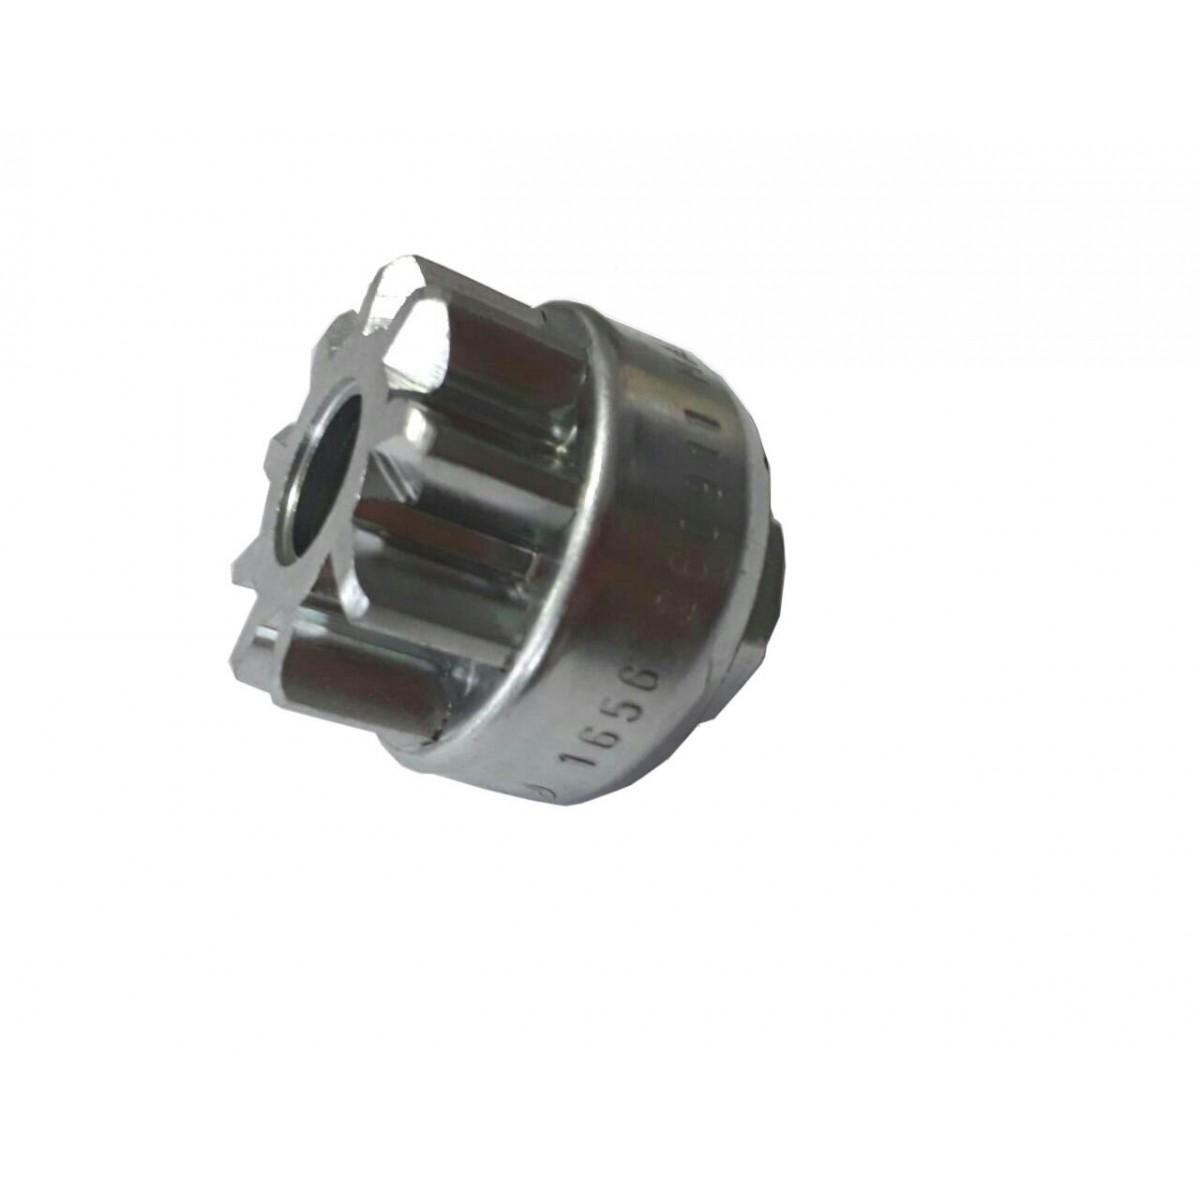 Bendix Motor Johnson/Evirunde 50/70 HP+  - Radical Peças - Peças para Jet Ski